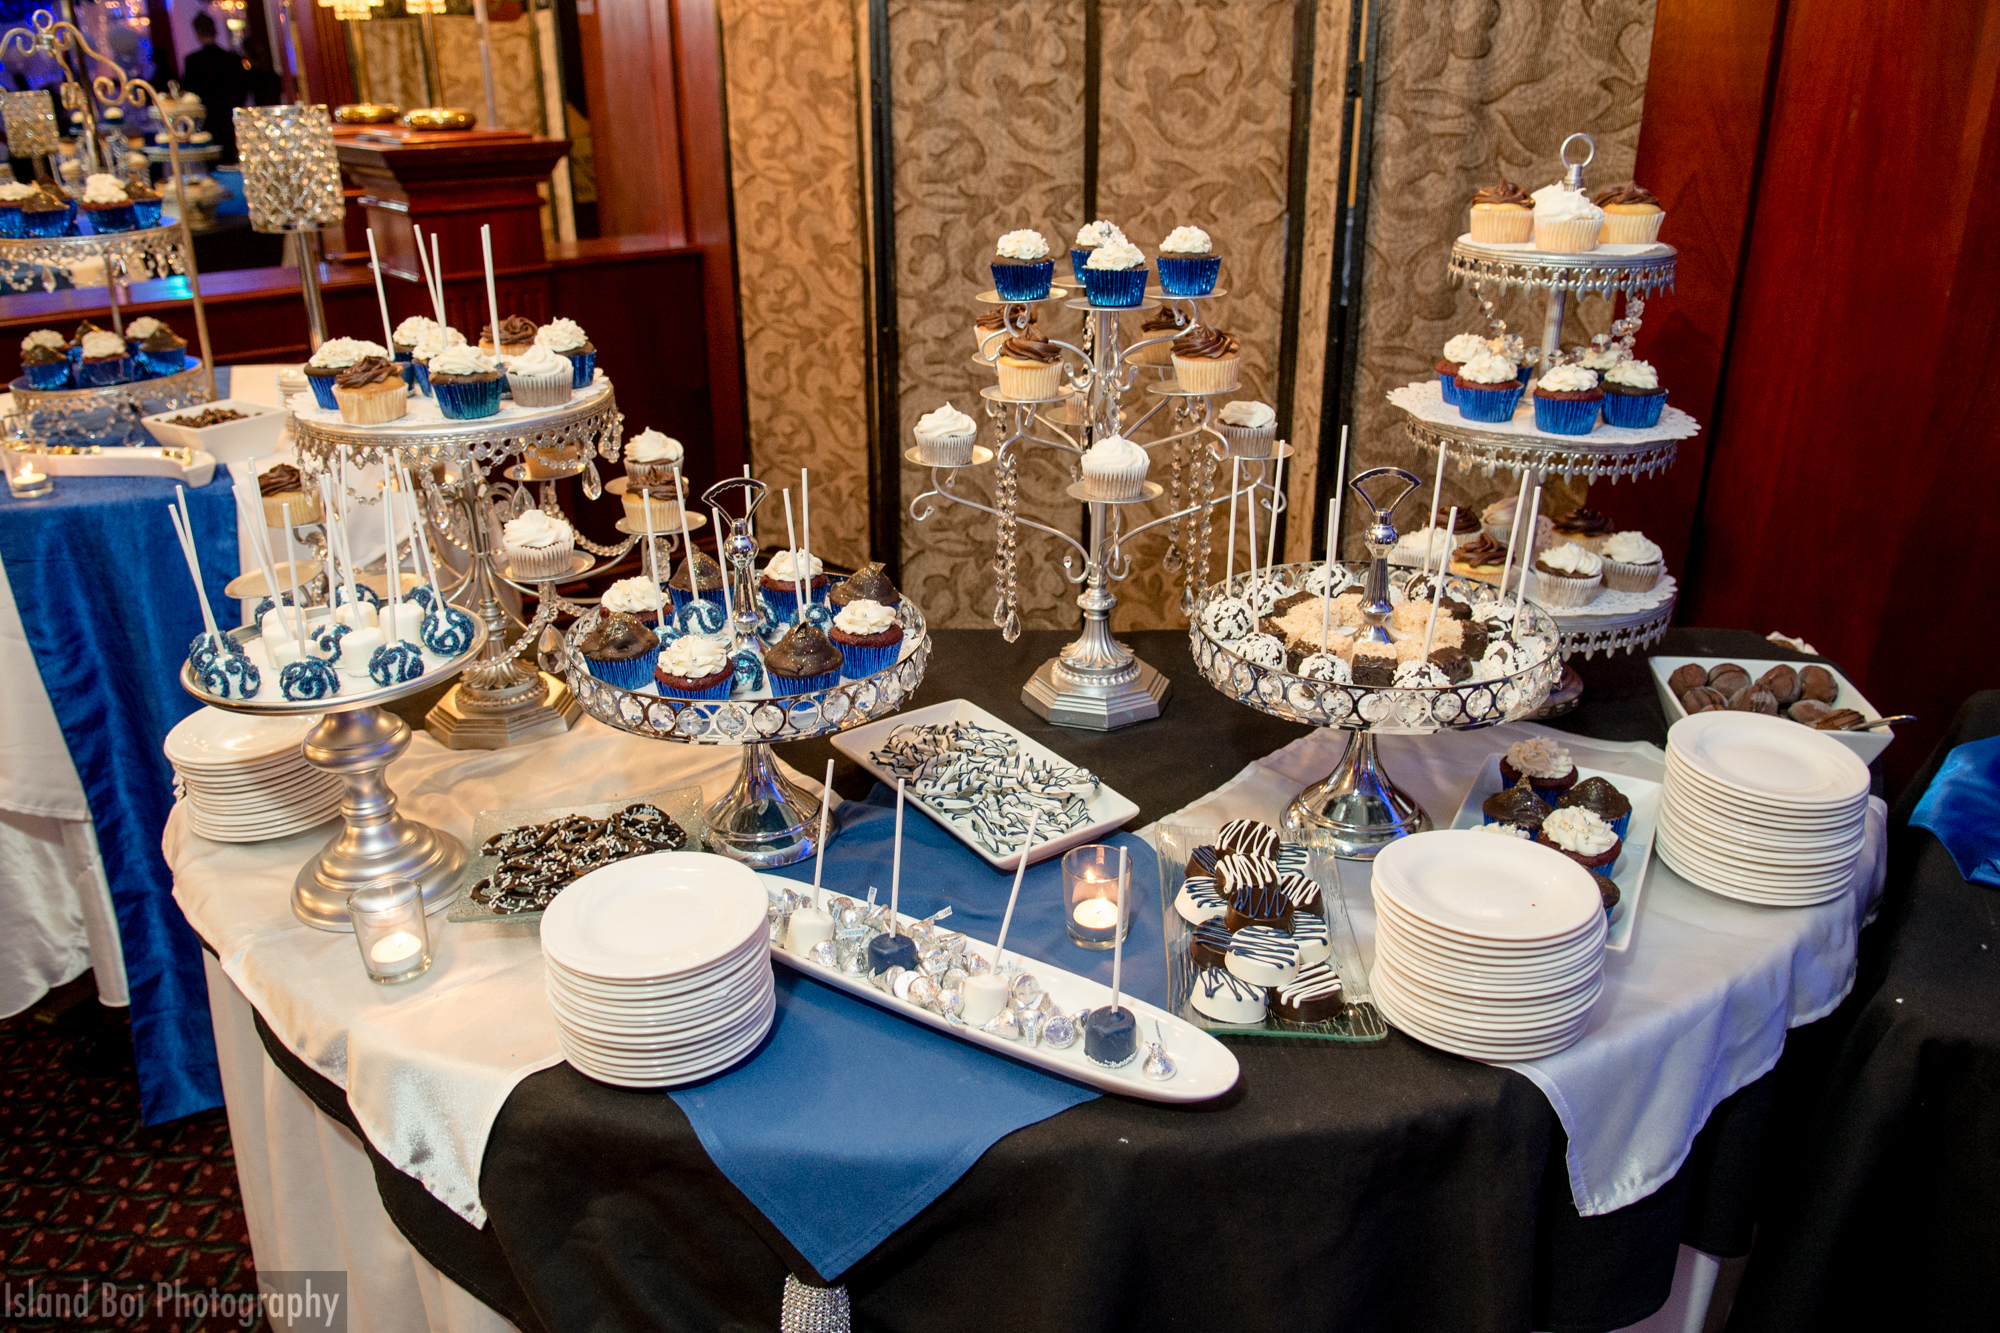 The royal wedding treat table